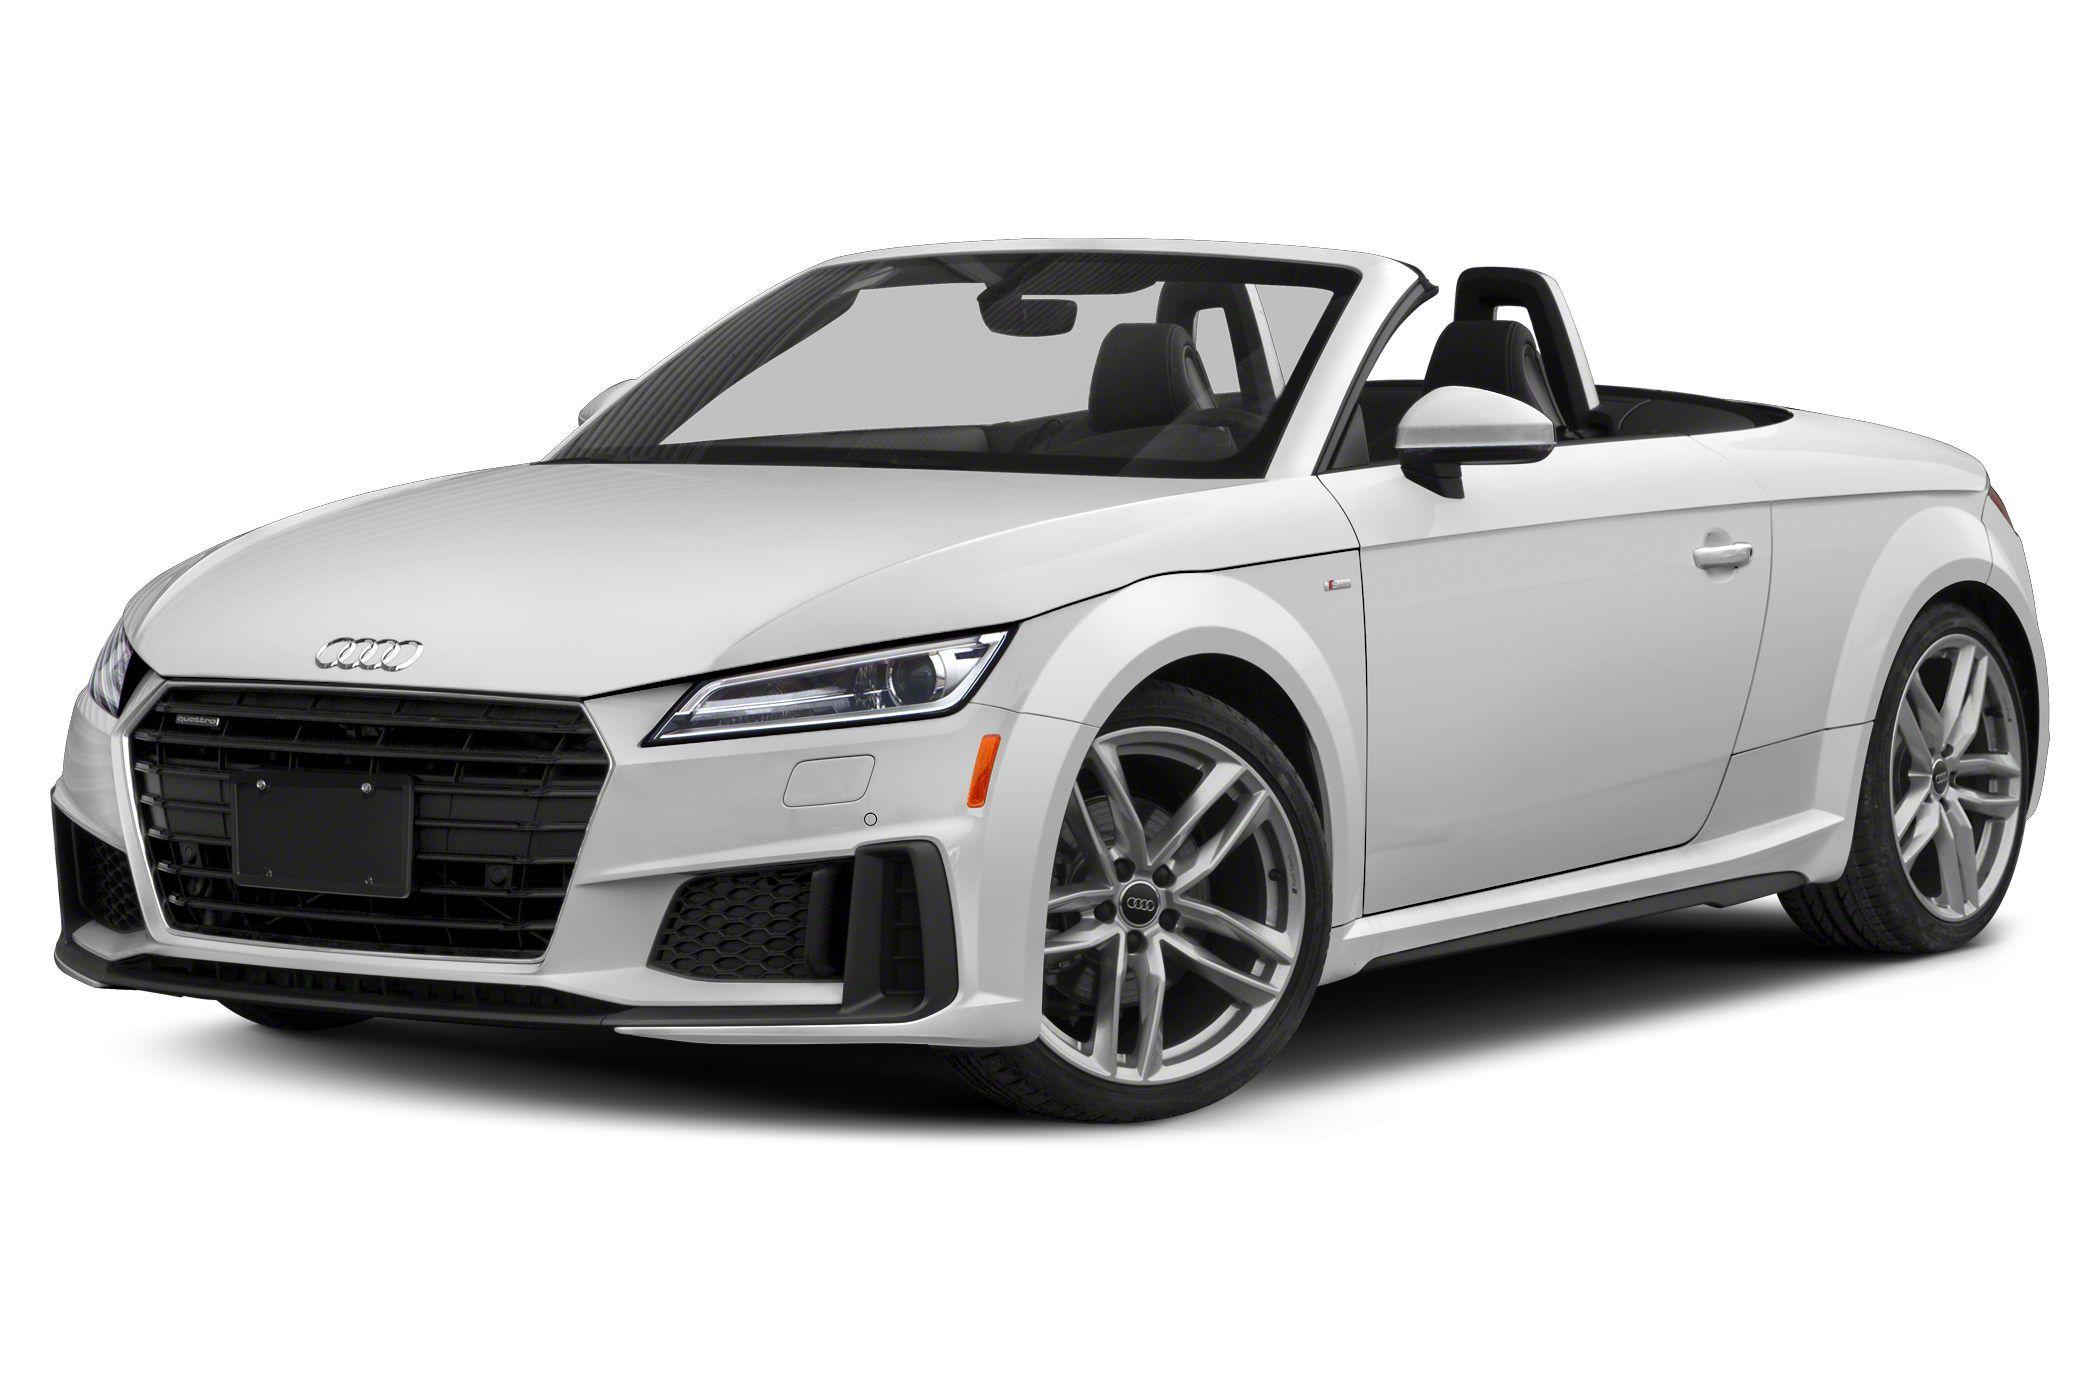 Audi Tt Convertible 2020 Spy Shoot in 2020 Audi tt, Audi